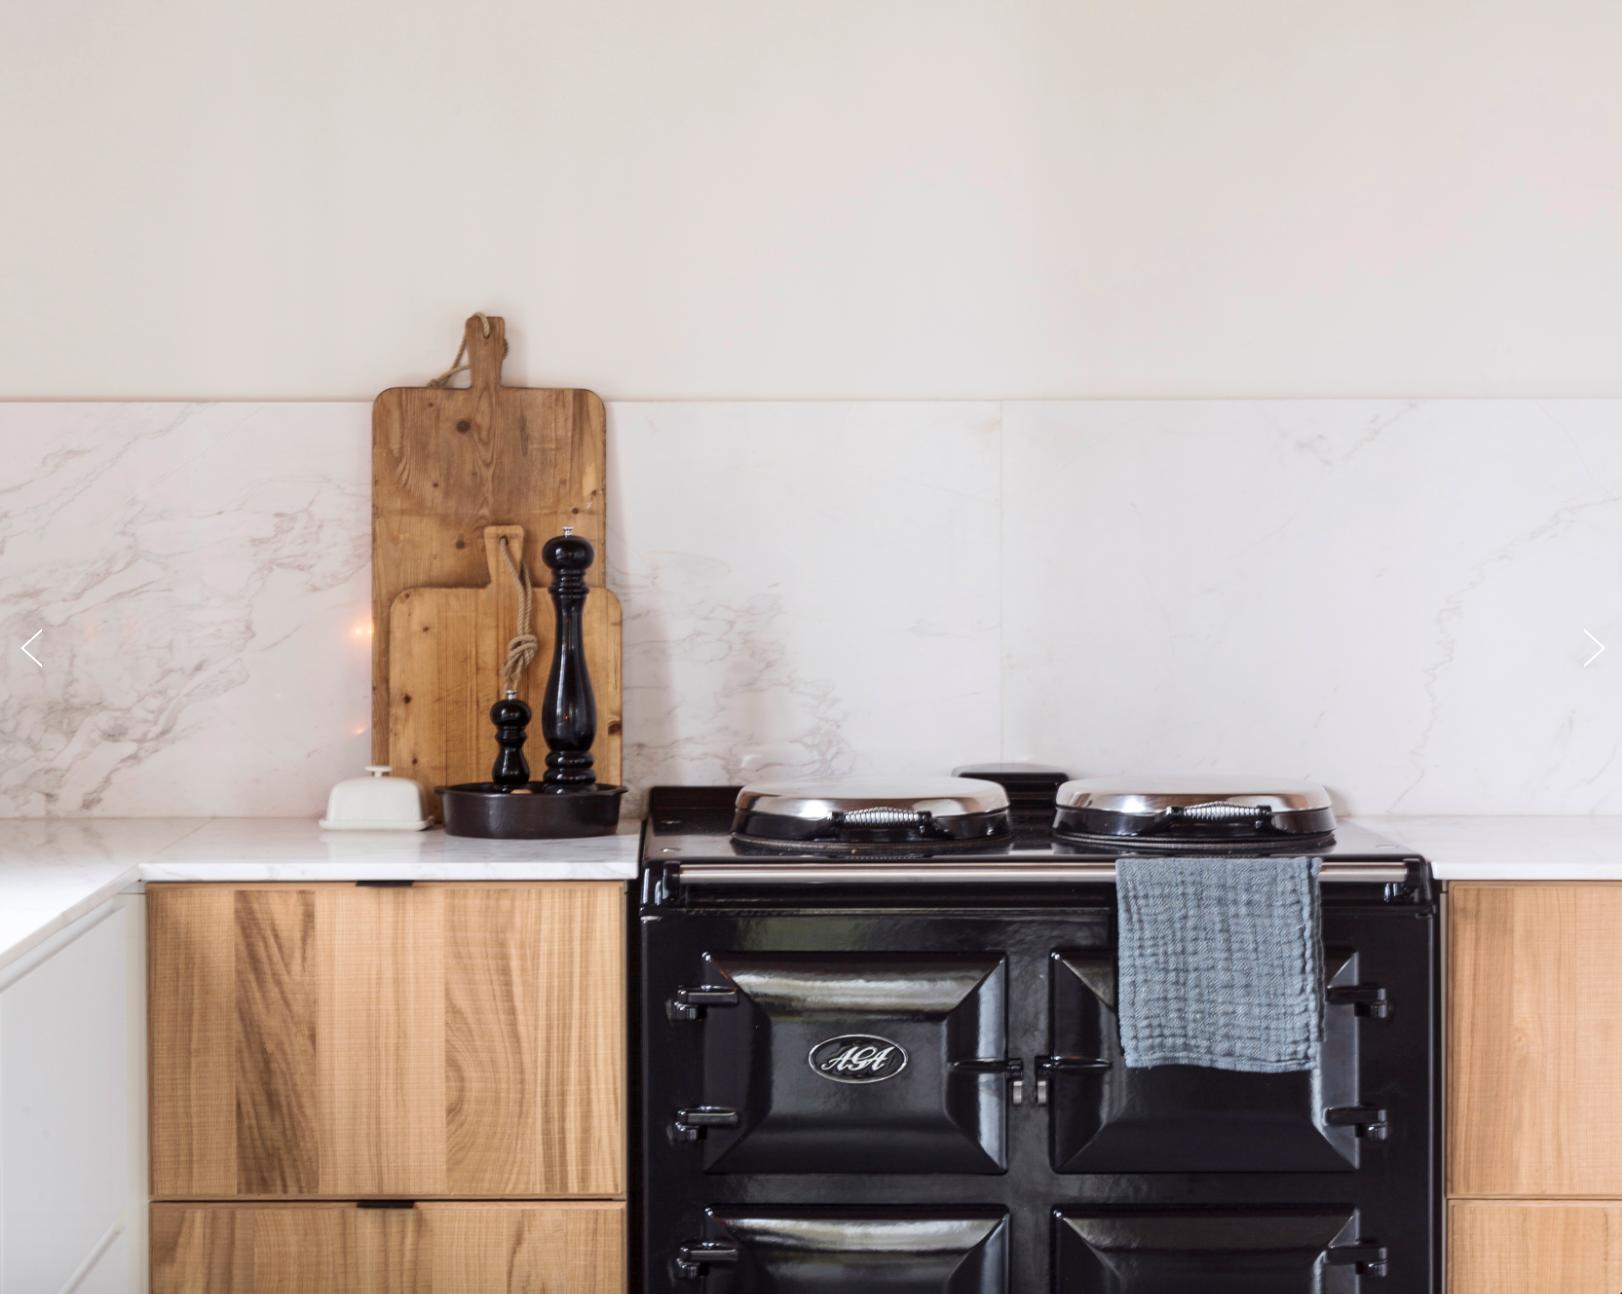 Klassiek aga fornuis geïntegreerd in moderne ikea keuken strak